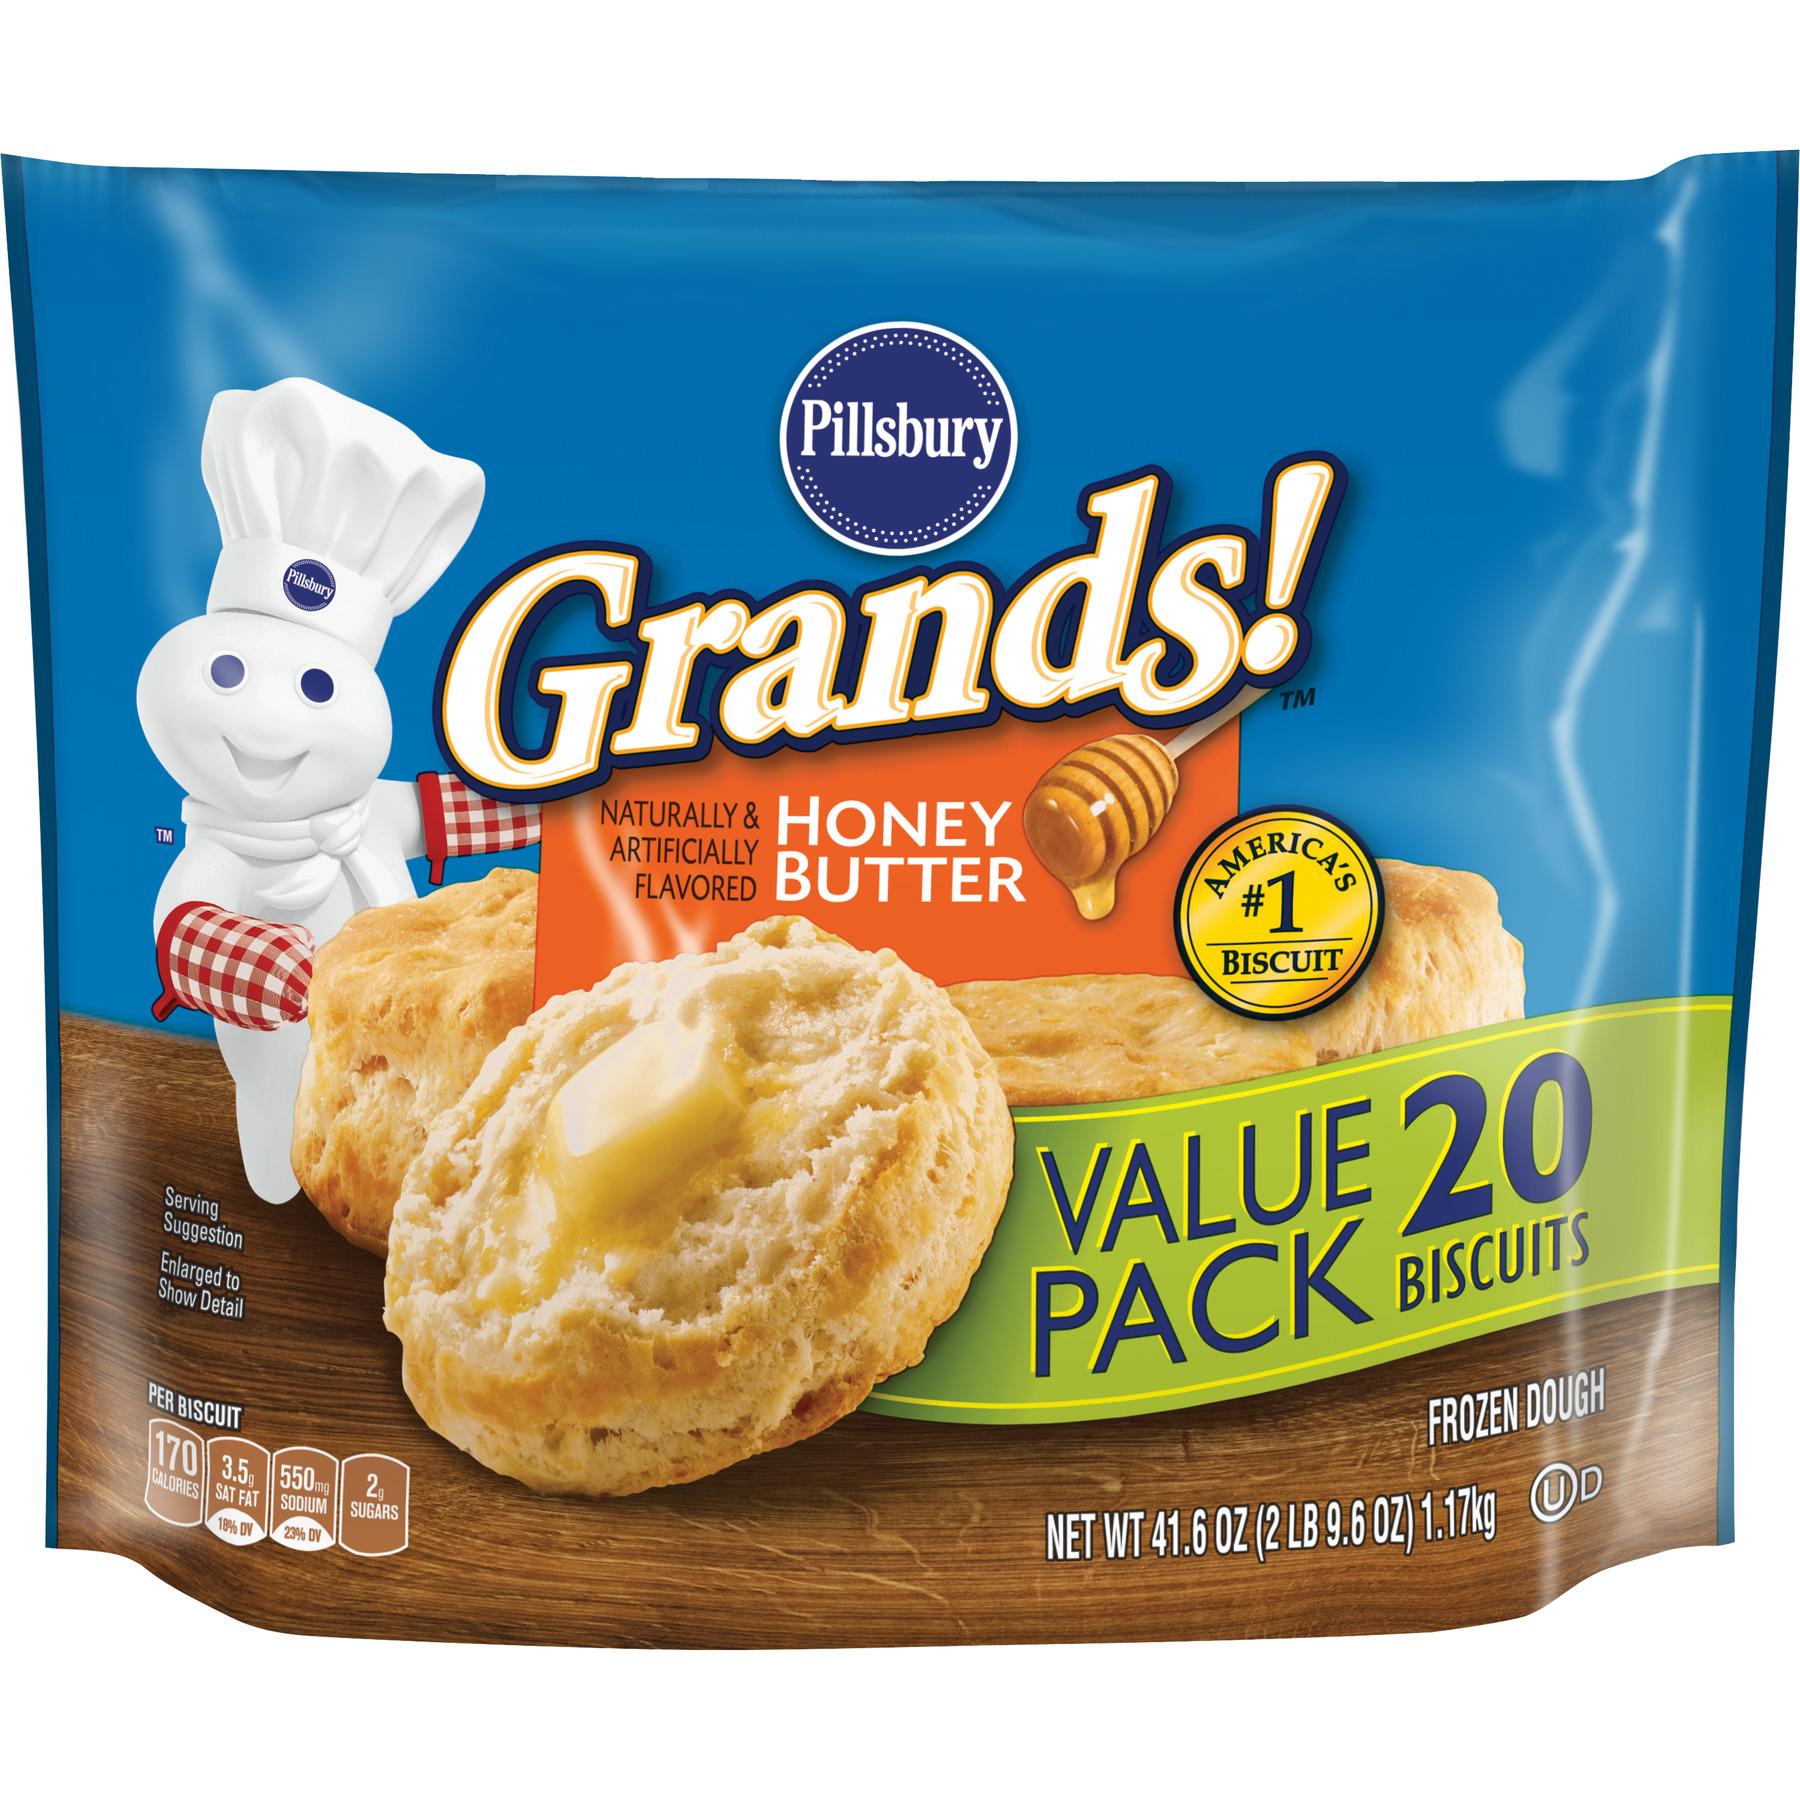 Pillsbury Grands! Honey Butter Biscuits Value Pack, 20 Ct, 41.6 oz